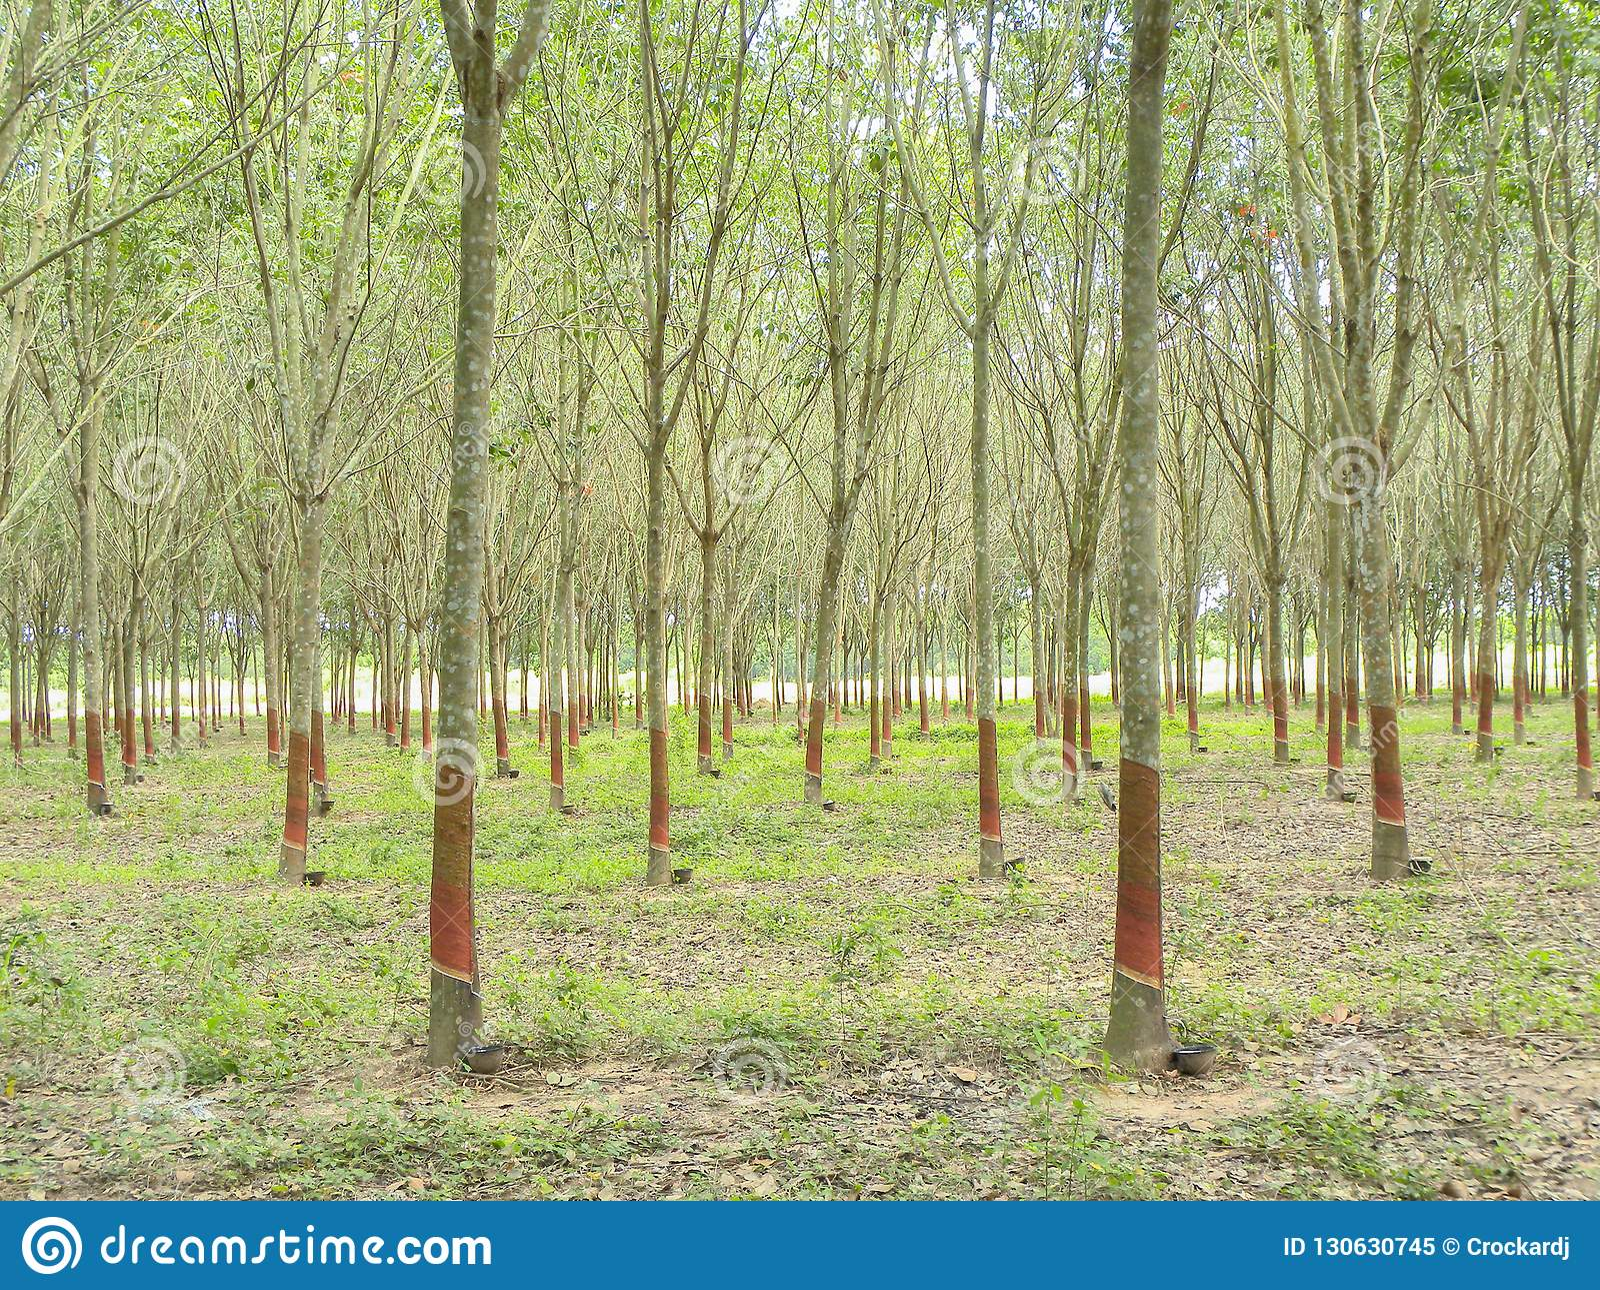 November 2017 - Chachoengsao, Thailand - Bosje van rubberbomen die worden geoogst